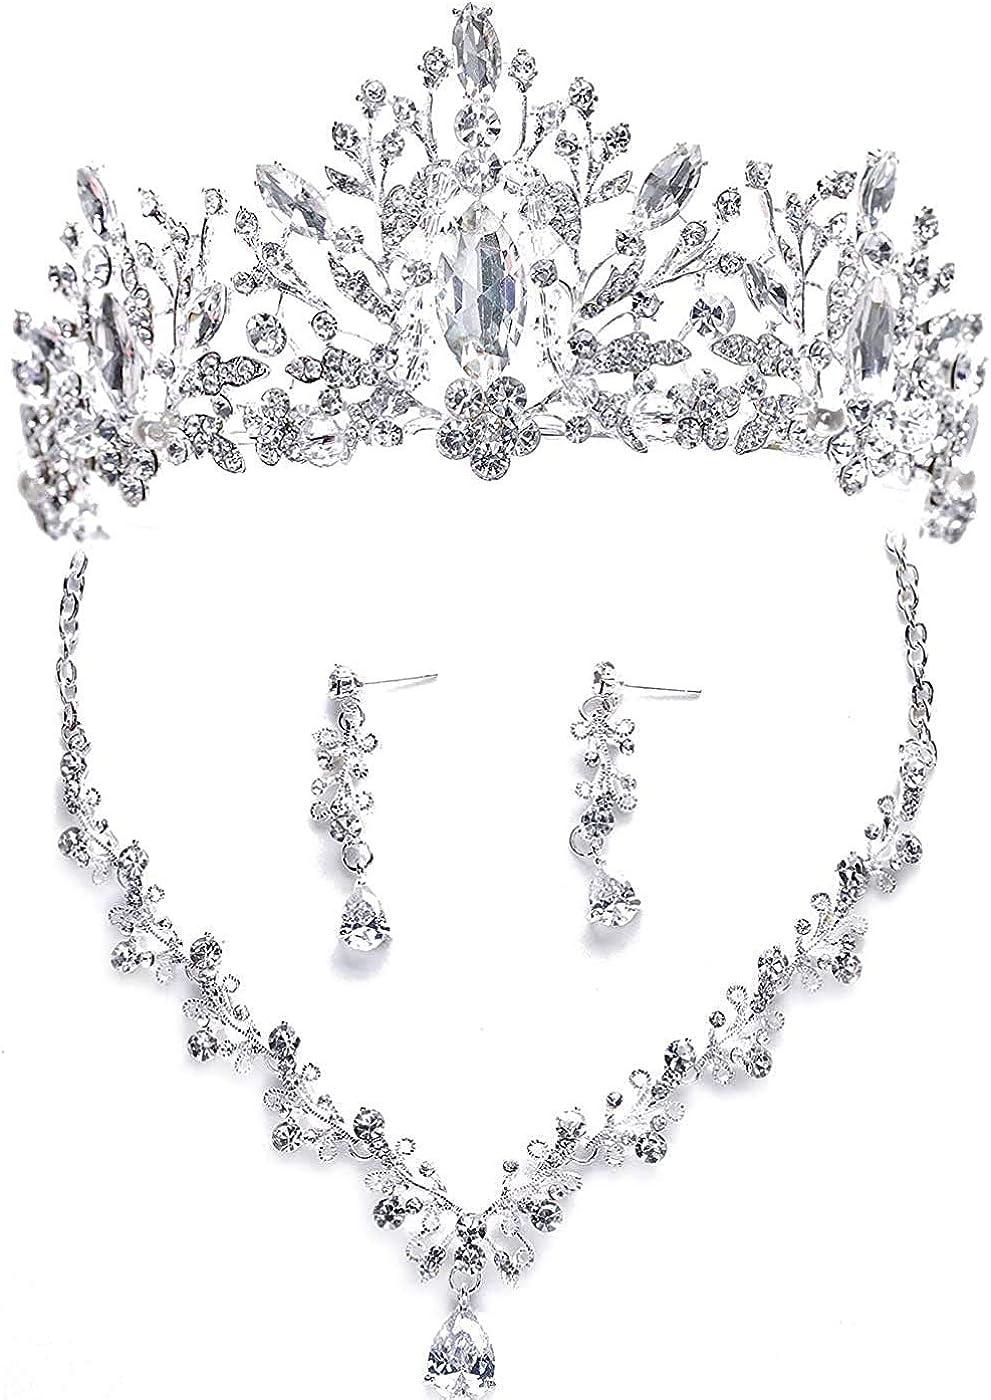 EverLove Women's Bride Headdress Jewelry Wedding Necklace Earrings Set Crystal Crown Tiara